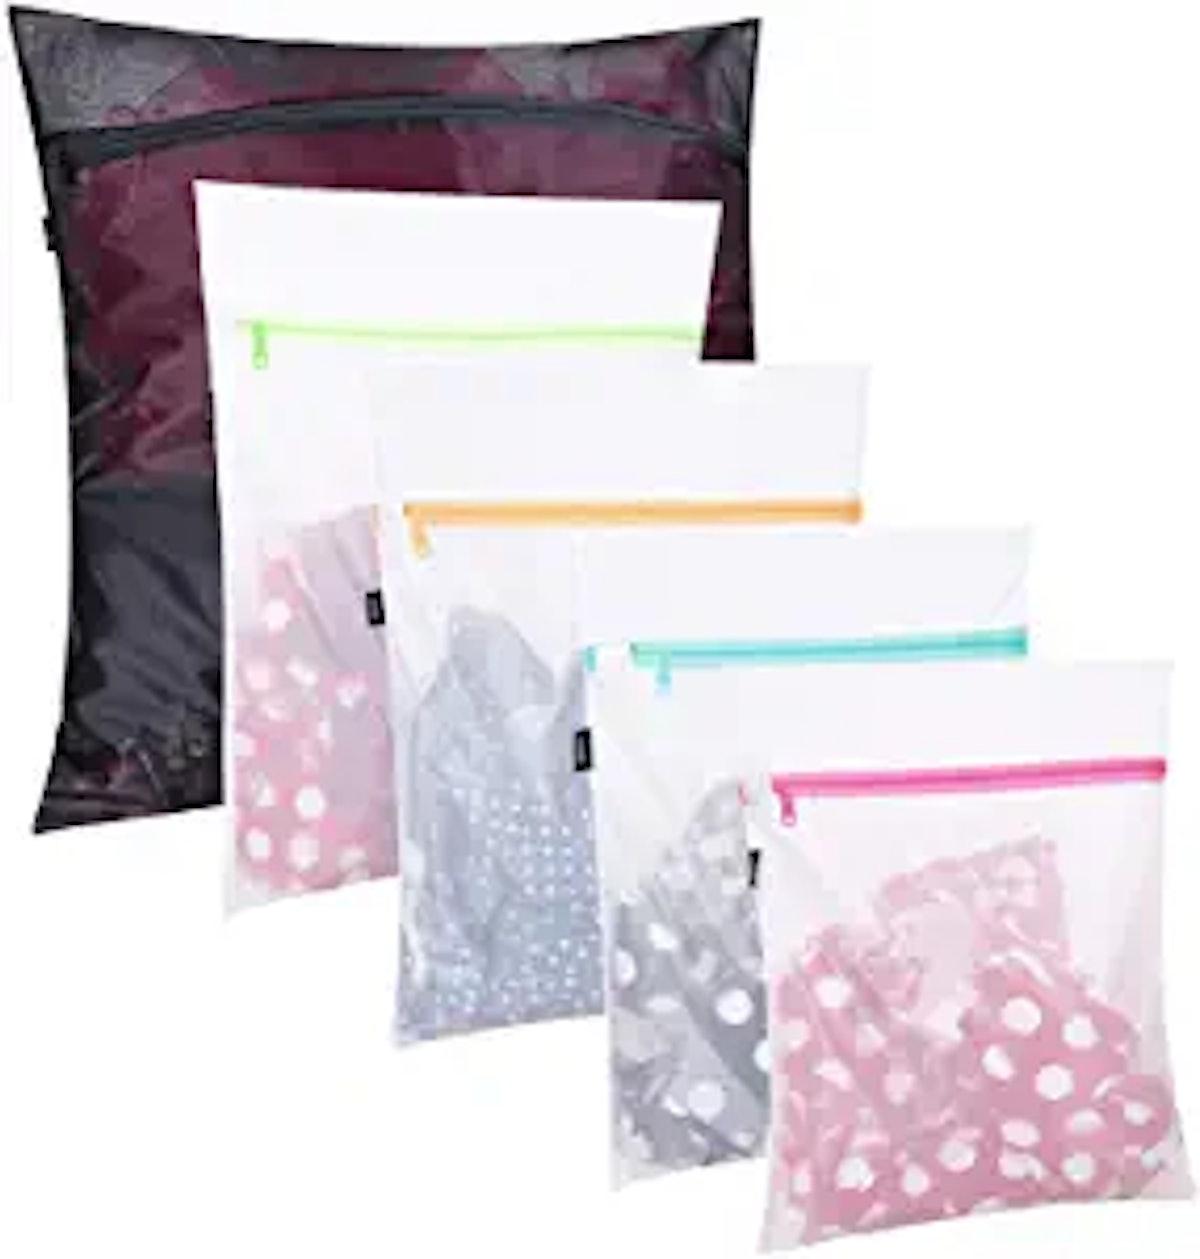 BAGAIL Mesh Laundry Bags (5-Piece Set)